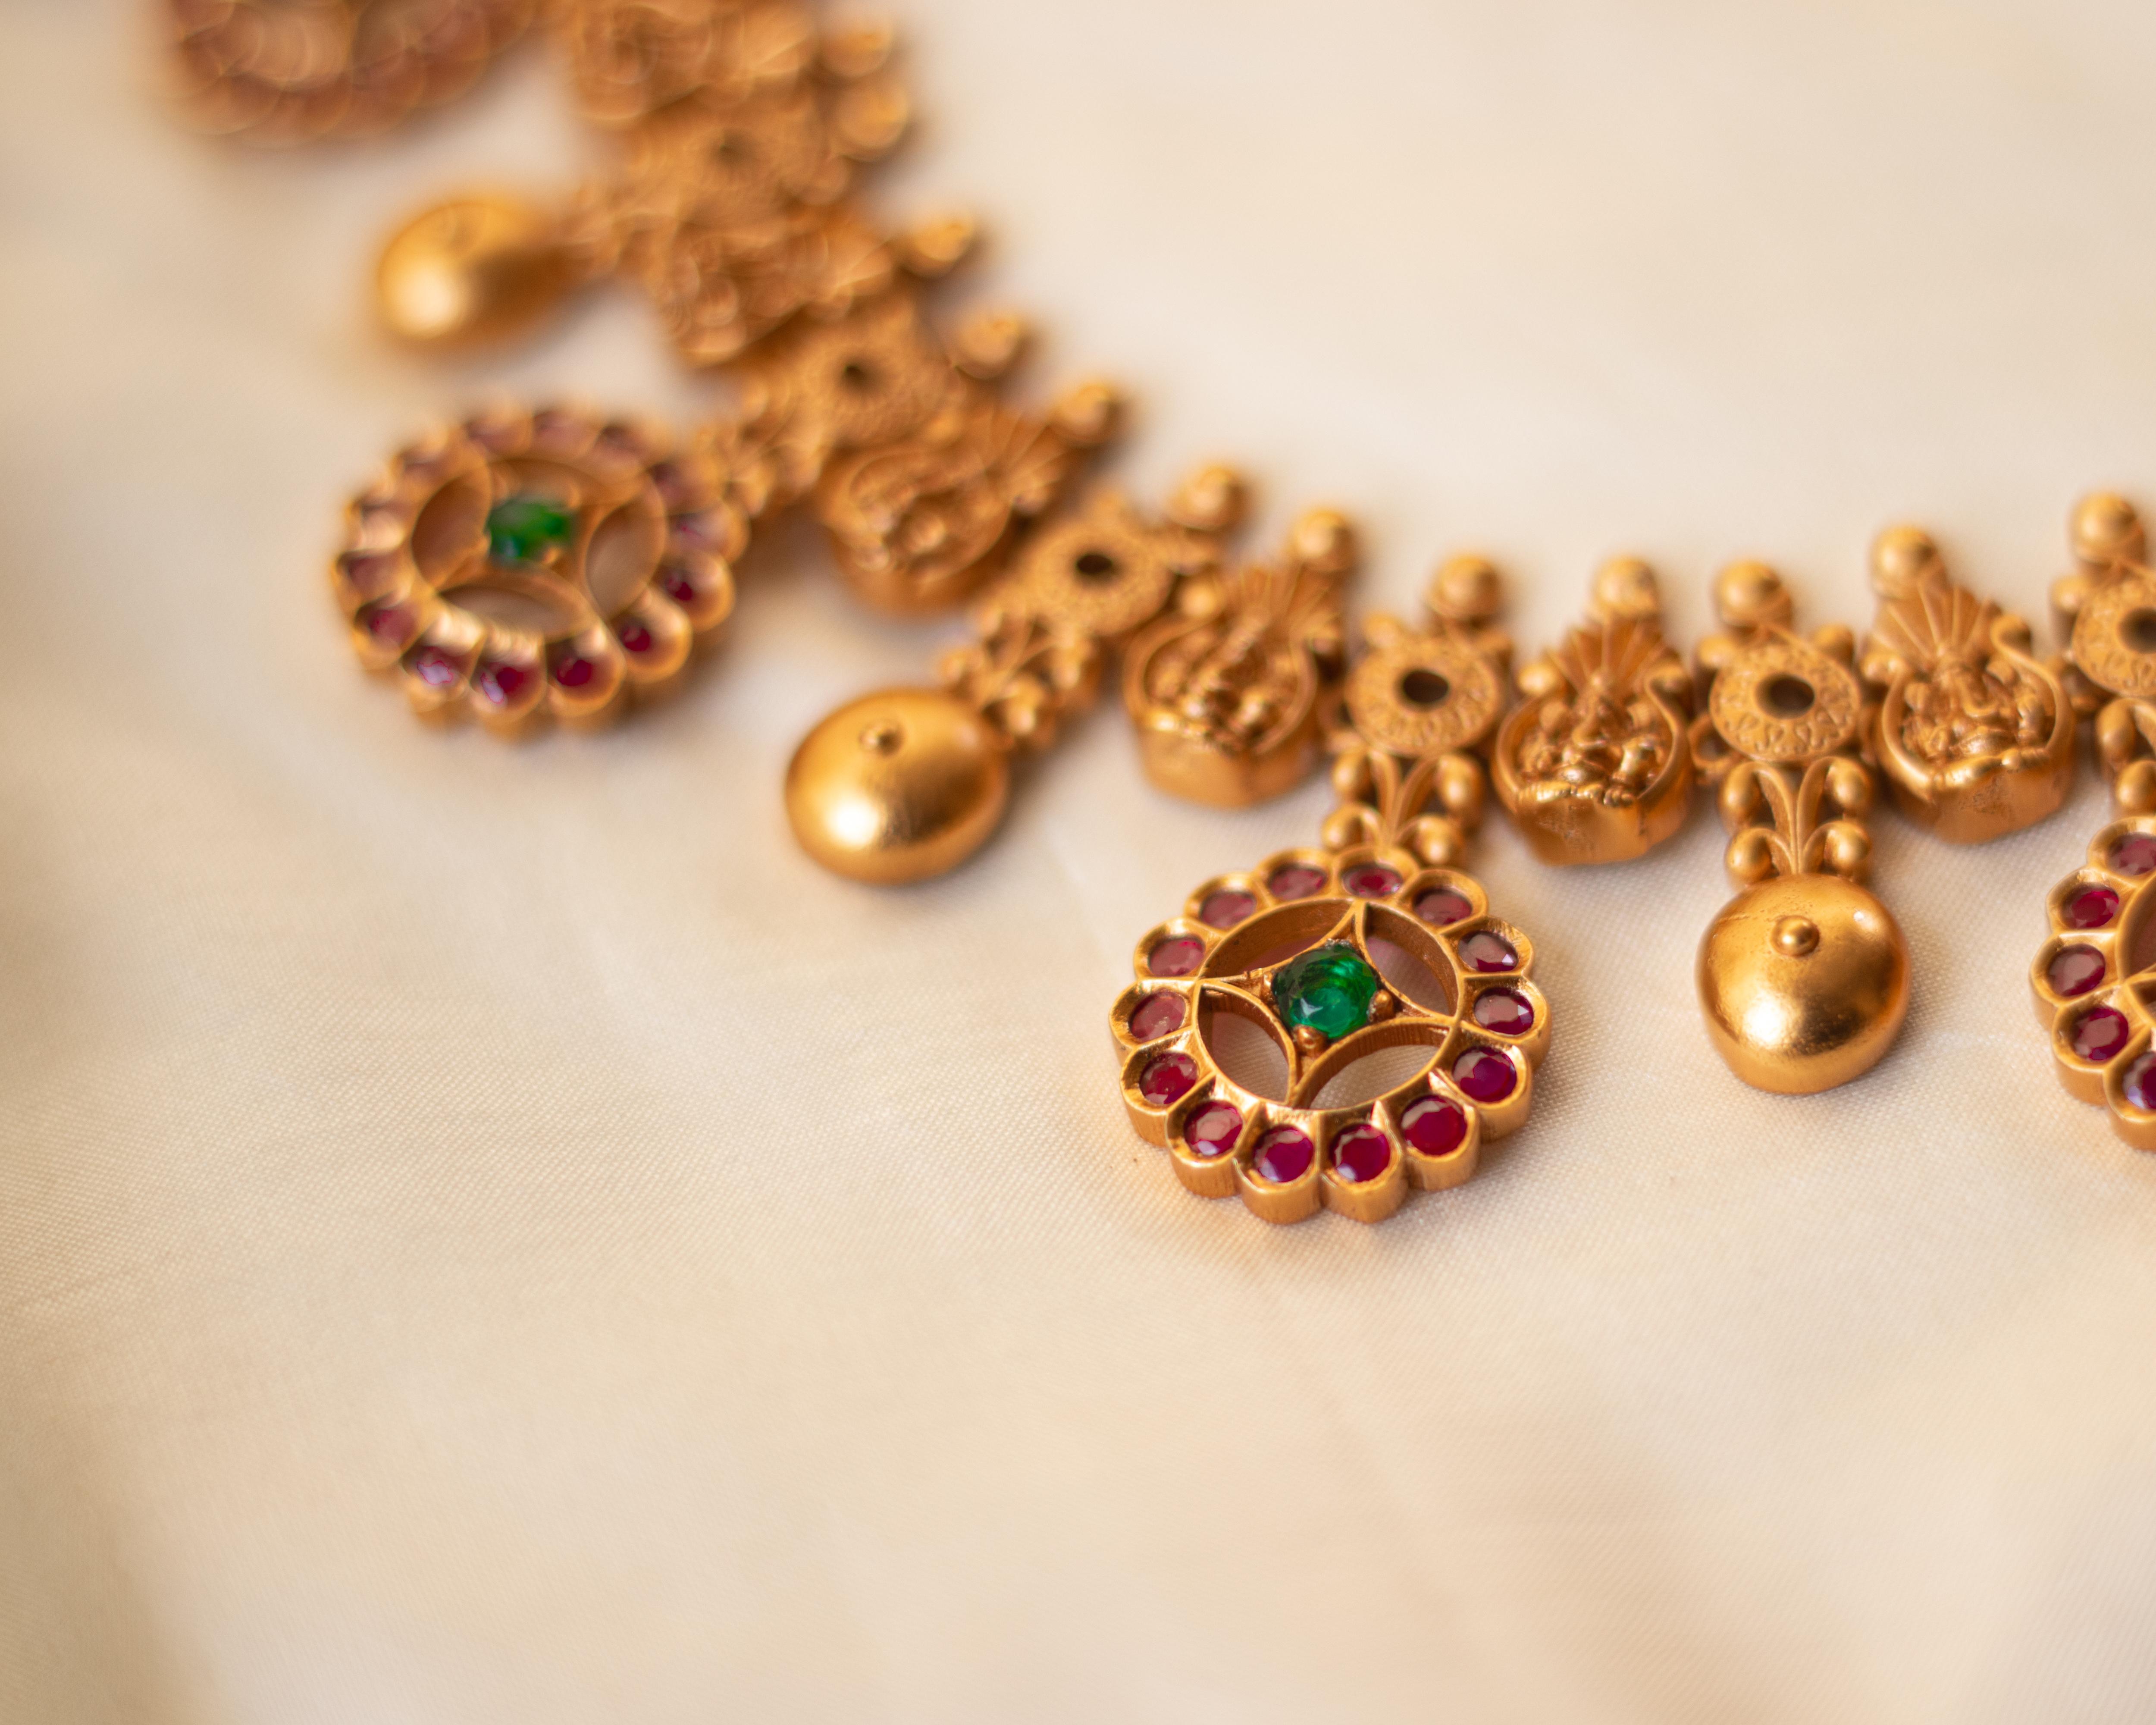 imitation-antique-jewellery-designs-20